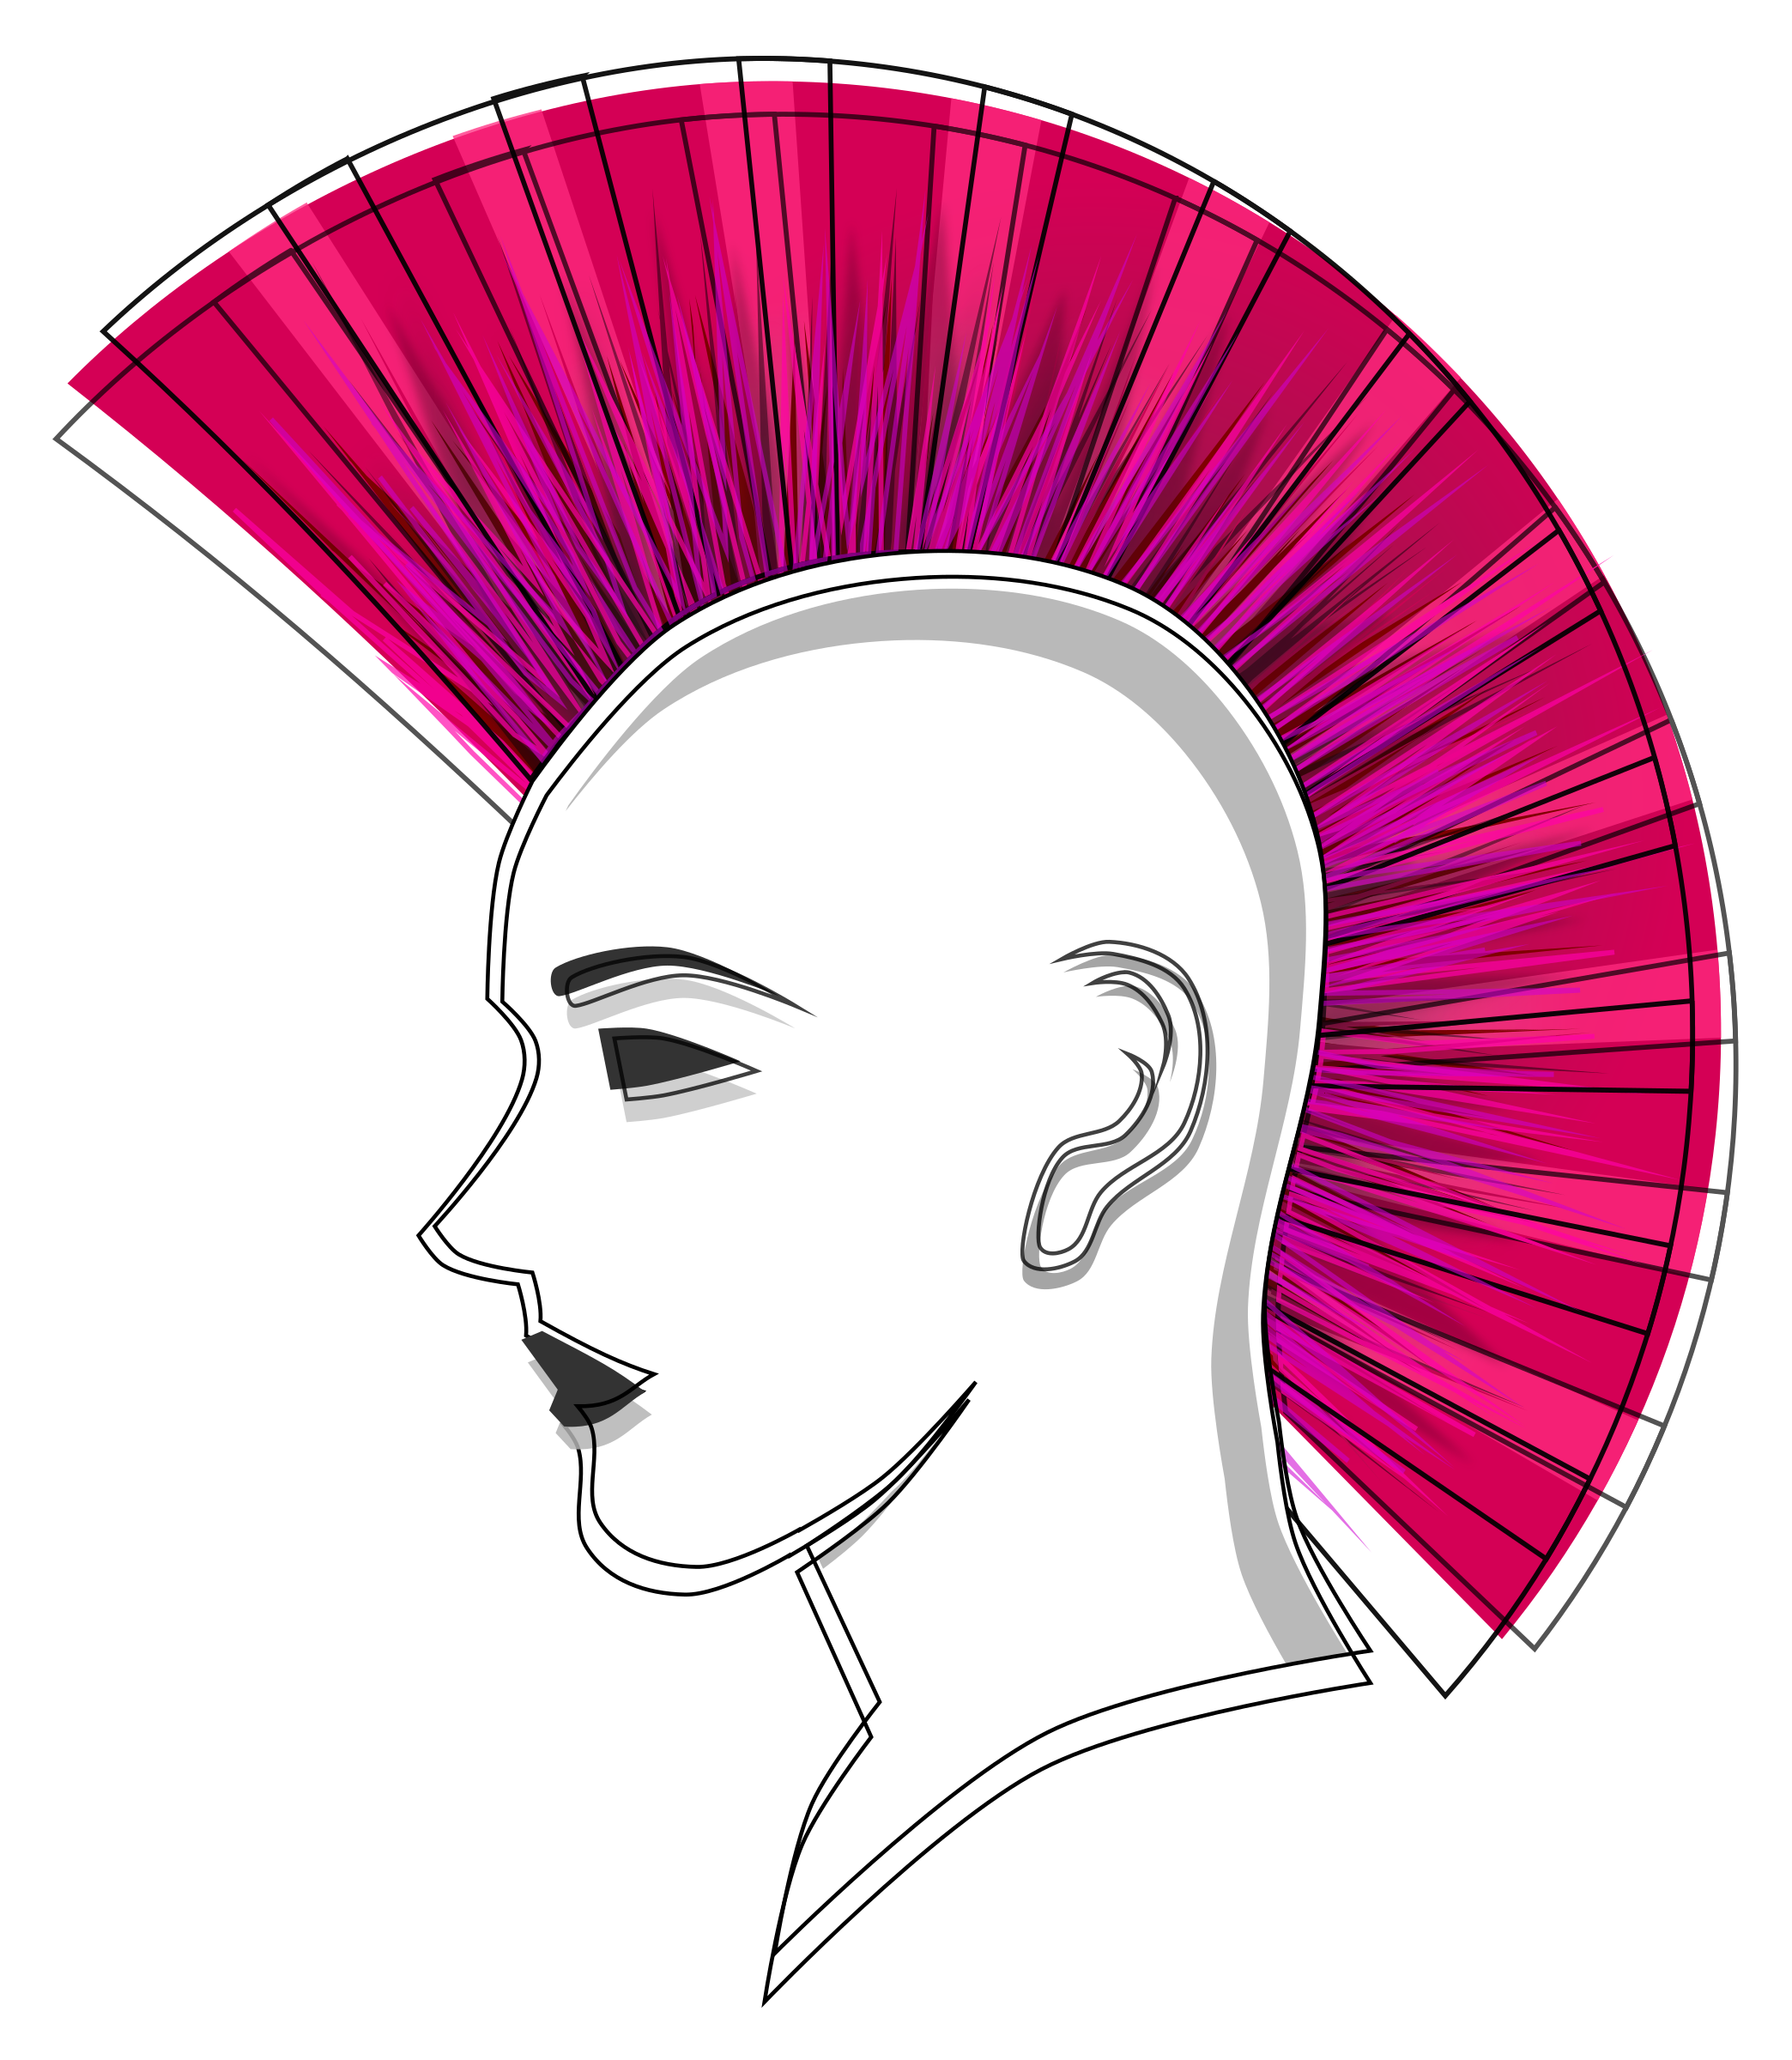 Mohawk Hair PNG - 42283